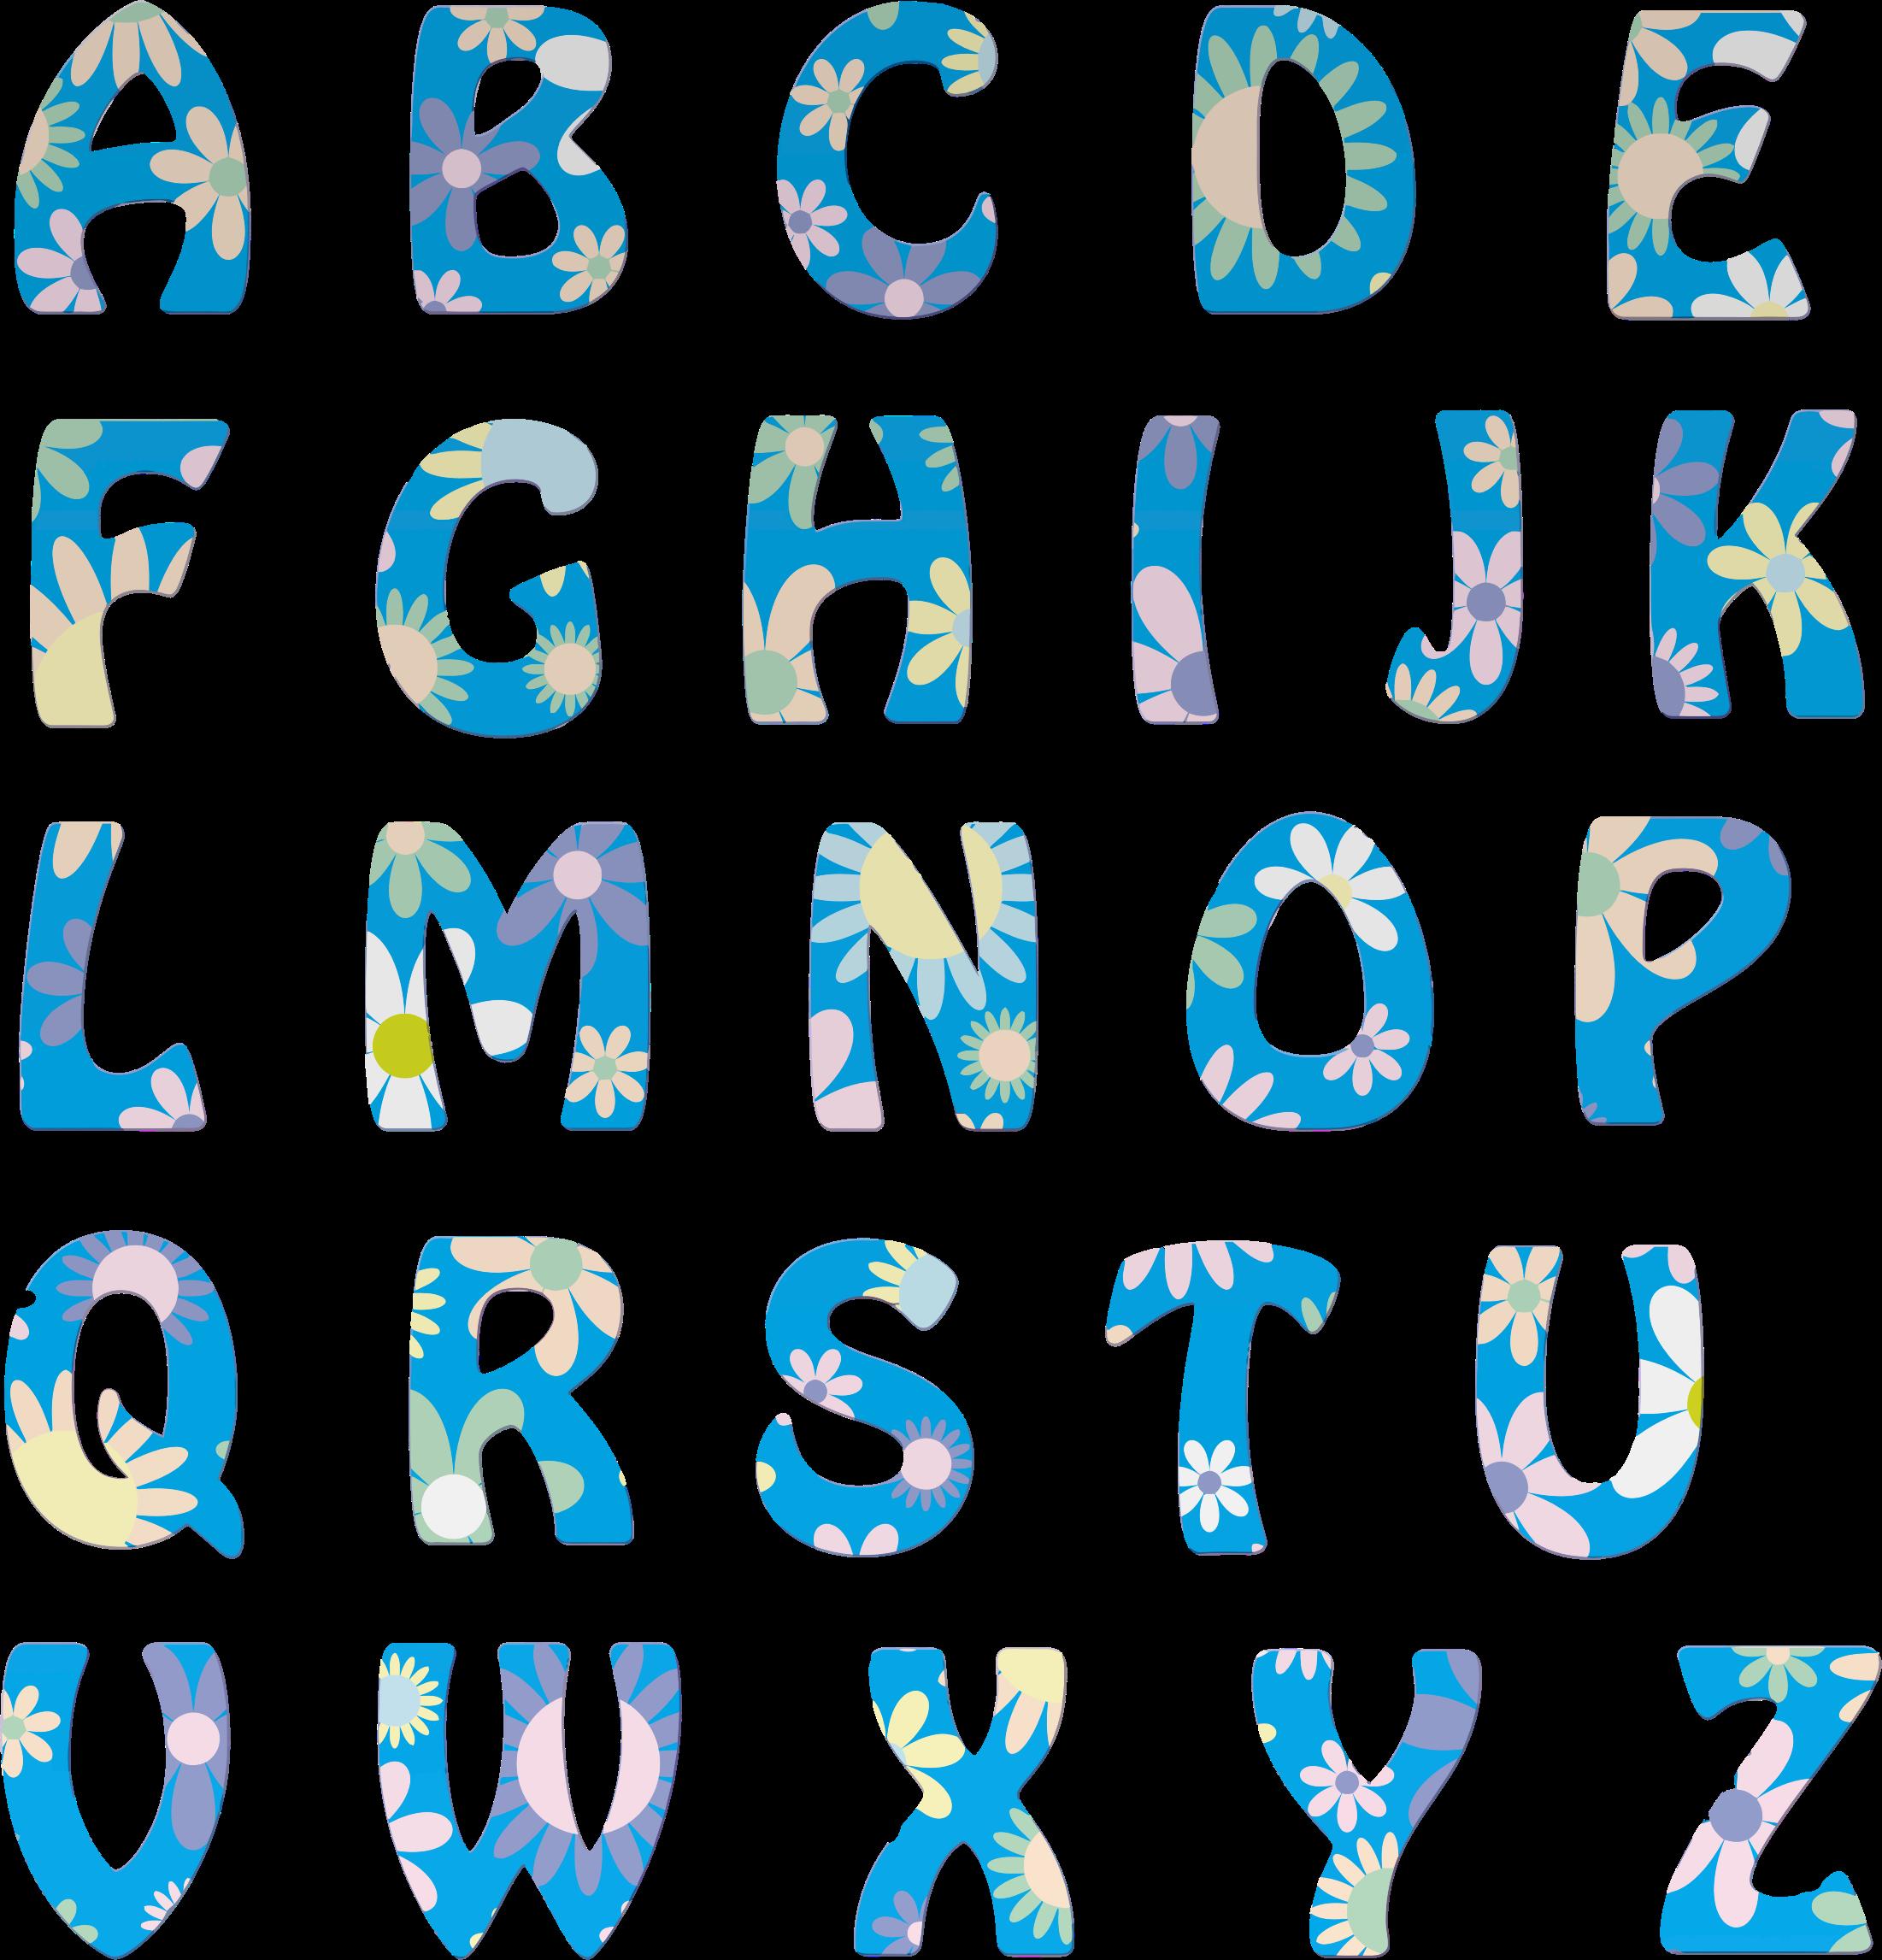 BIG IMAGE (PNG) - Alphabets PNG